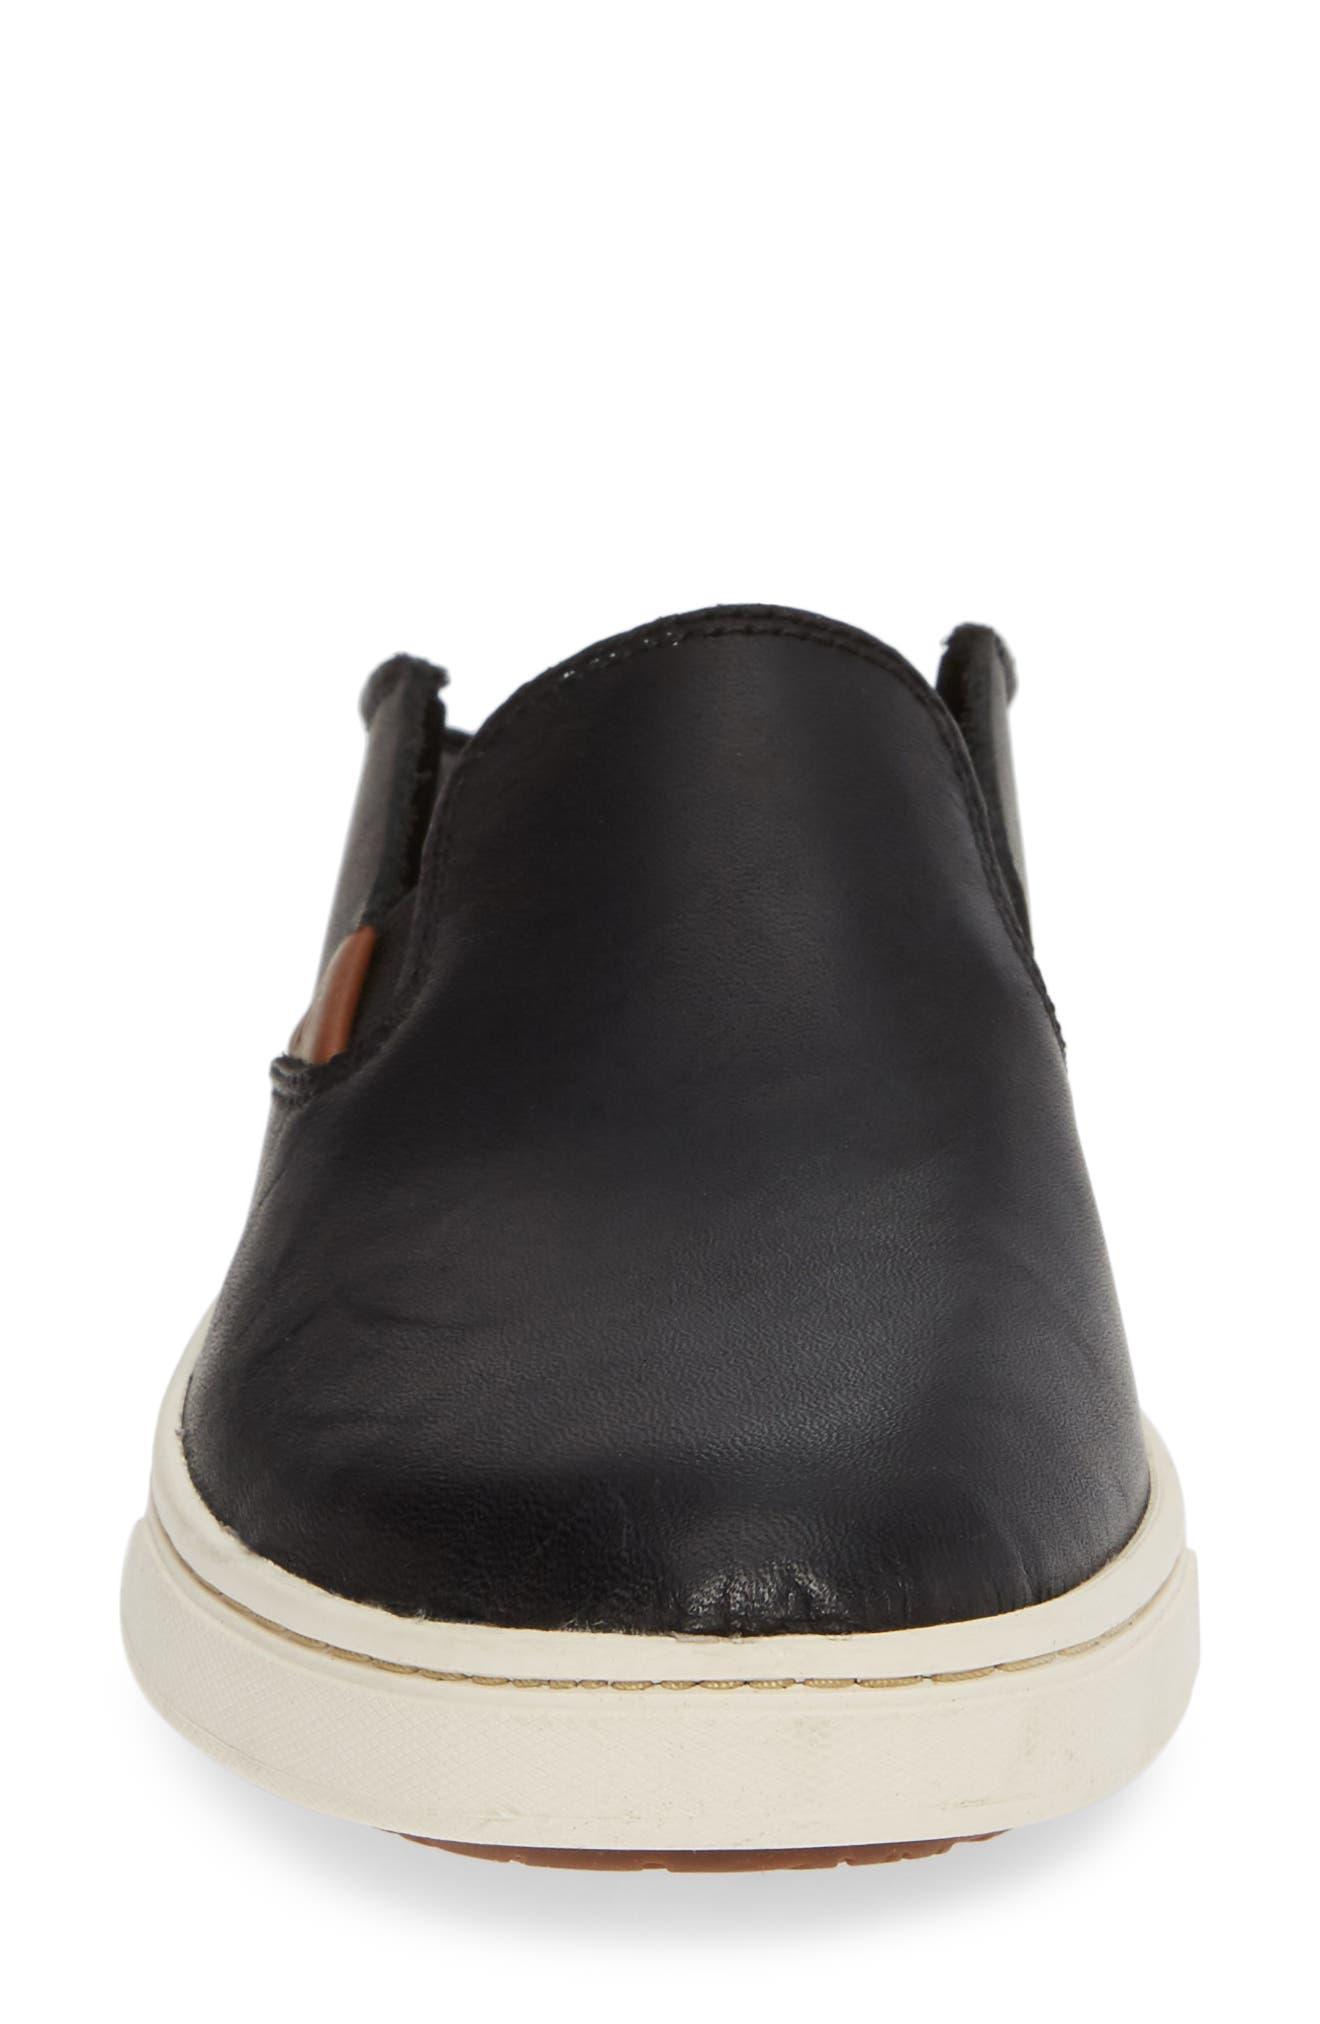 Pehuea Slip-On Sneaker,                             Alternate thumbnail 5, color,                             BLACK/ BLACK LEATHER